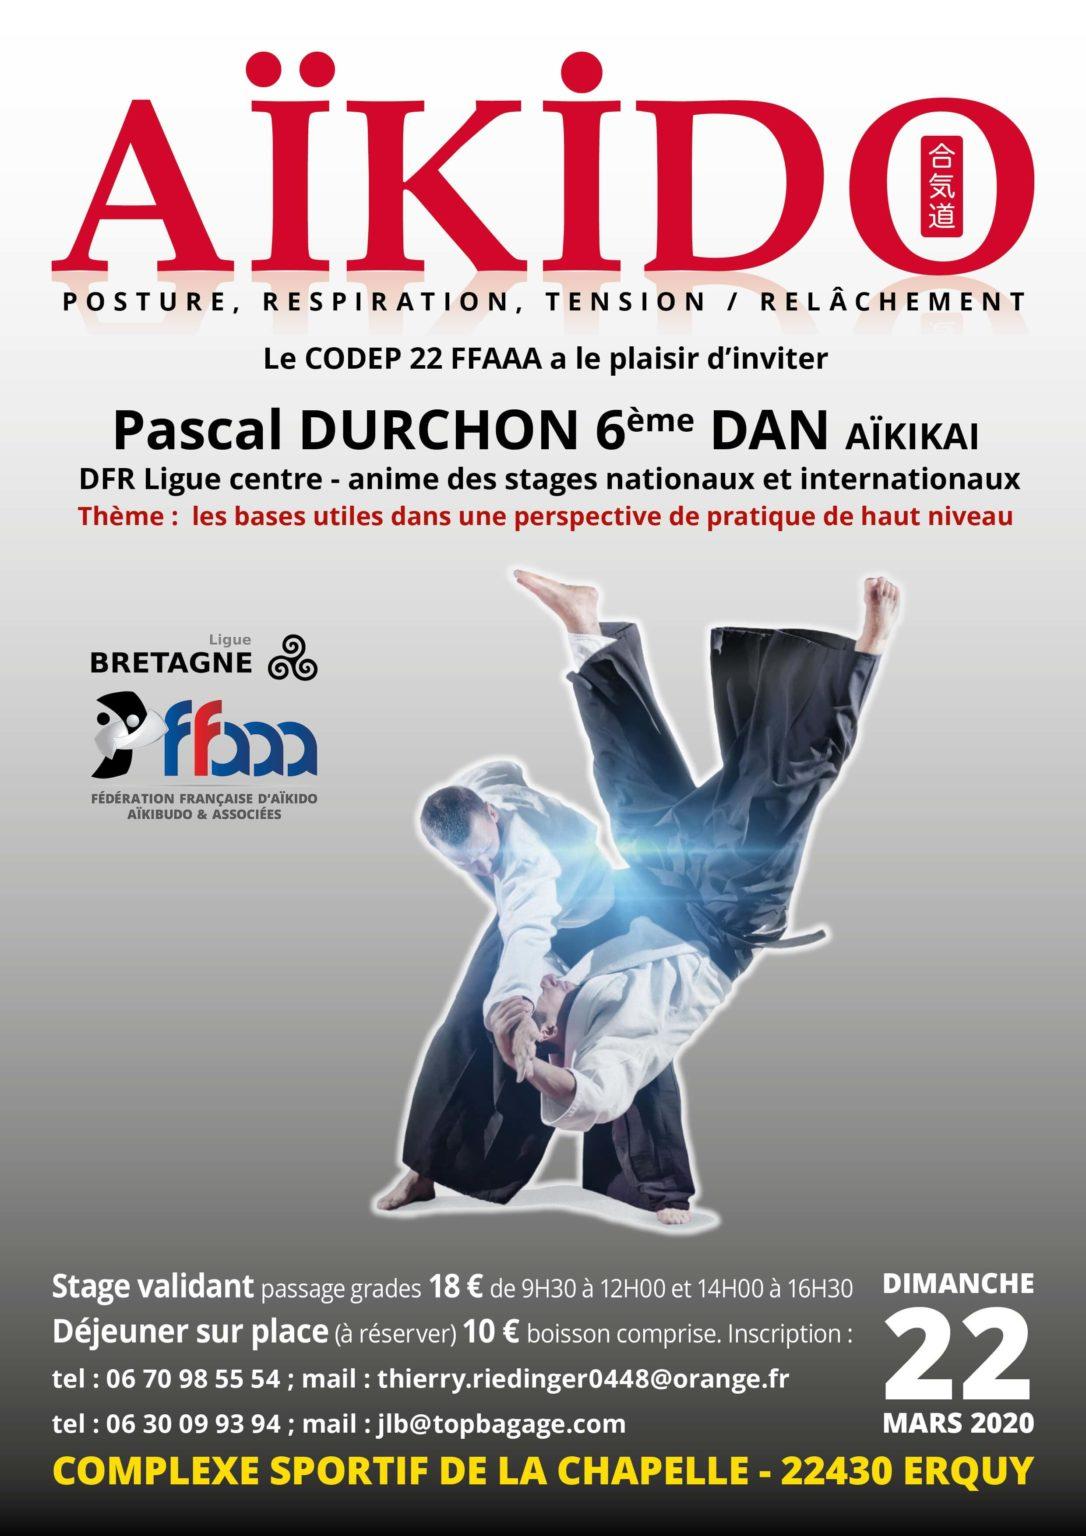 https://www.aikido-bretagne.com/wp-content/uploads/2020/02/Affiche-stage-Codep22-22-mars-2020-Erquy-A4-v3-comp-1086x1536